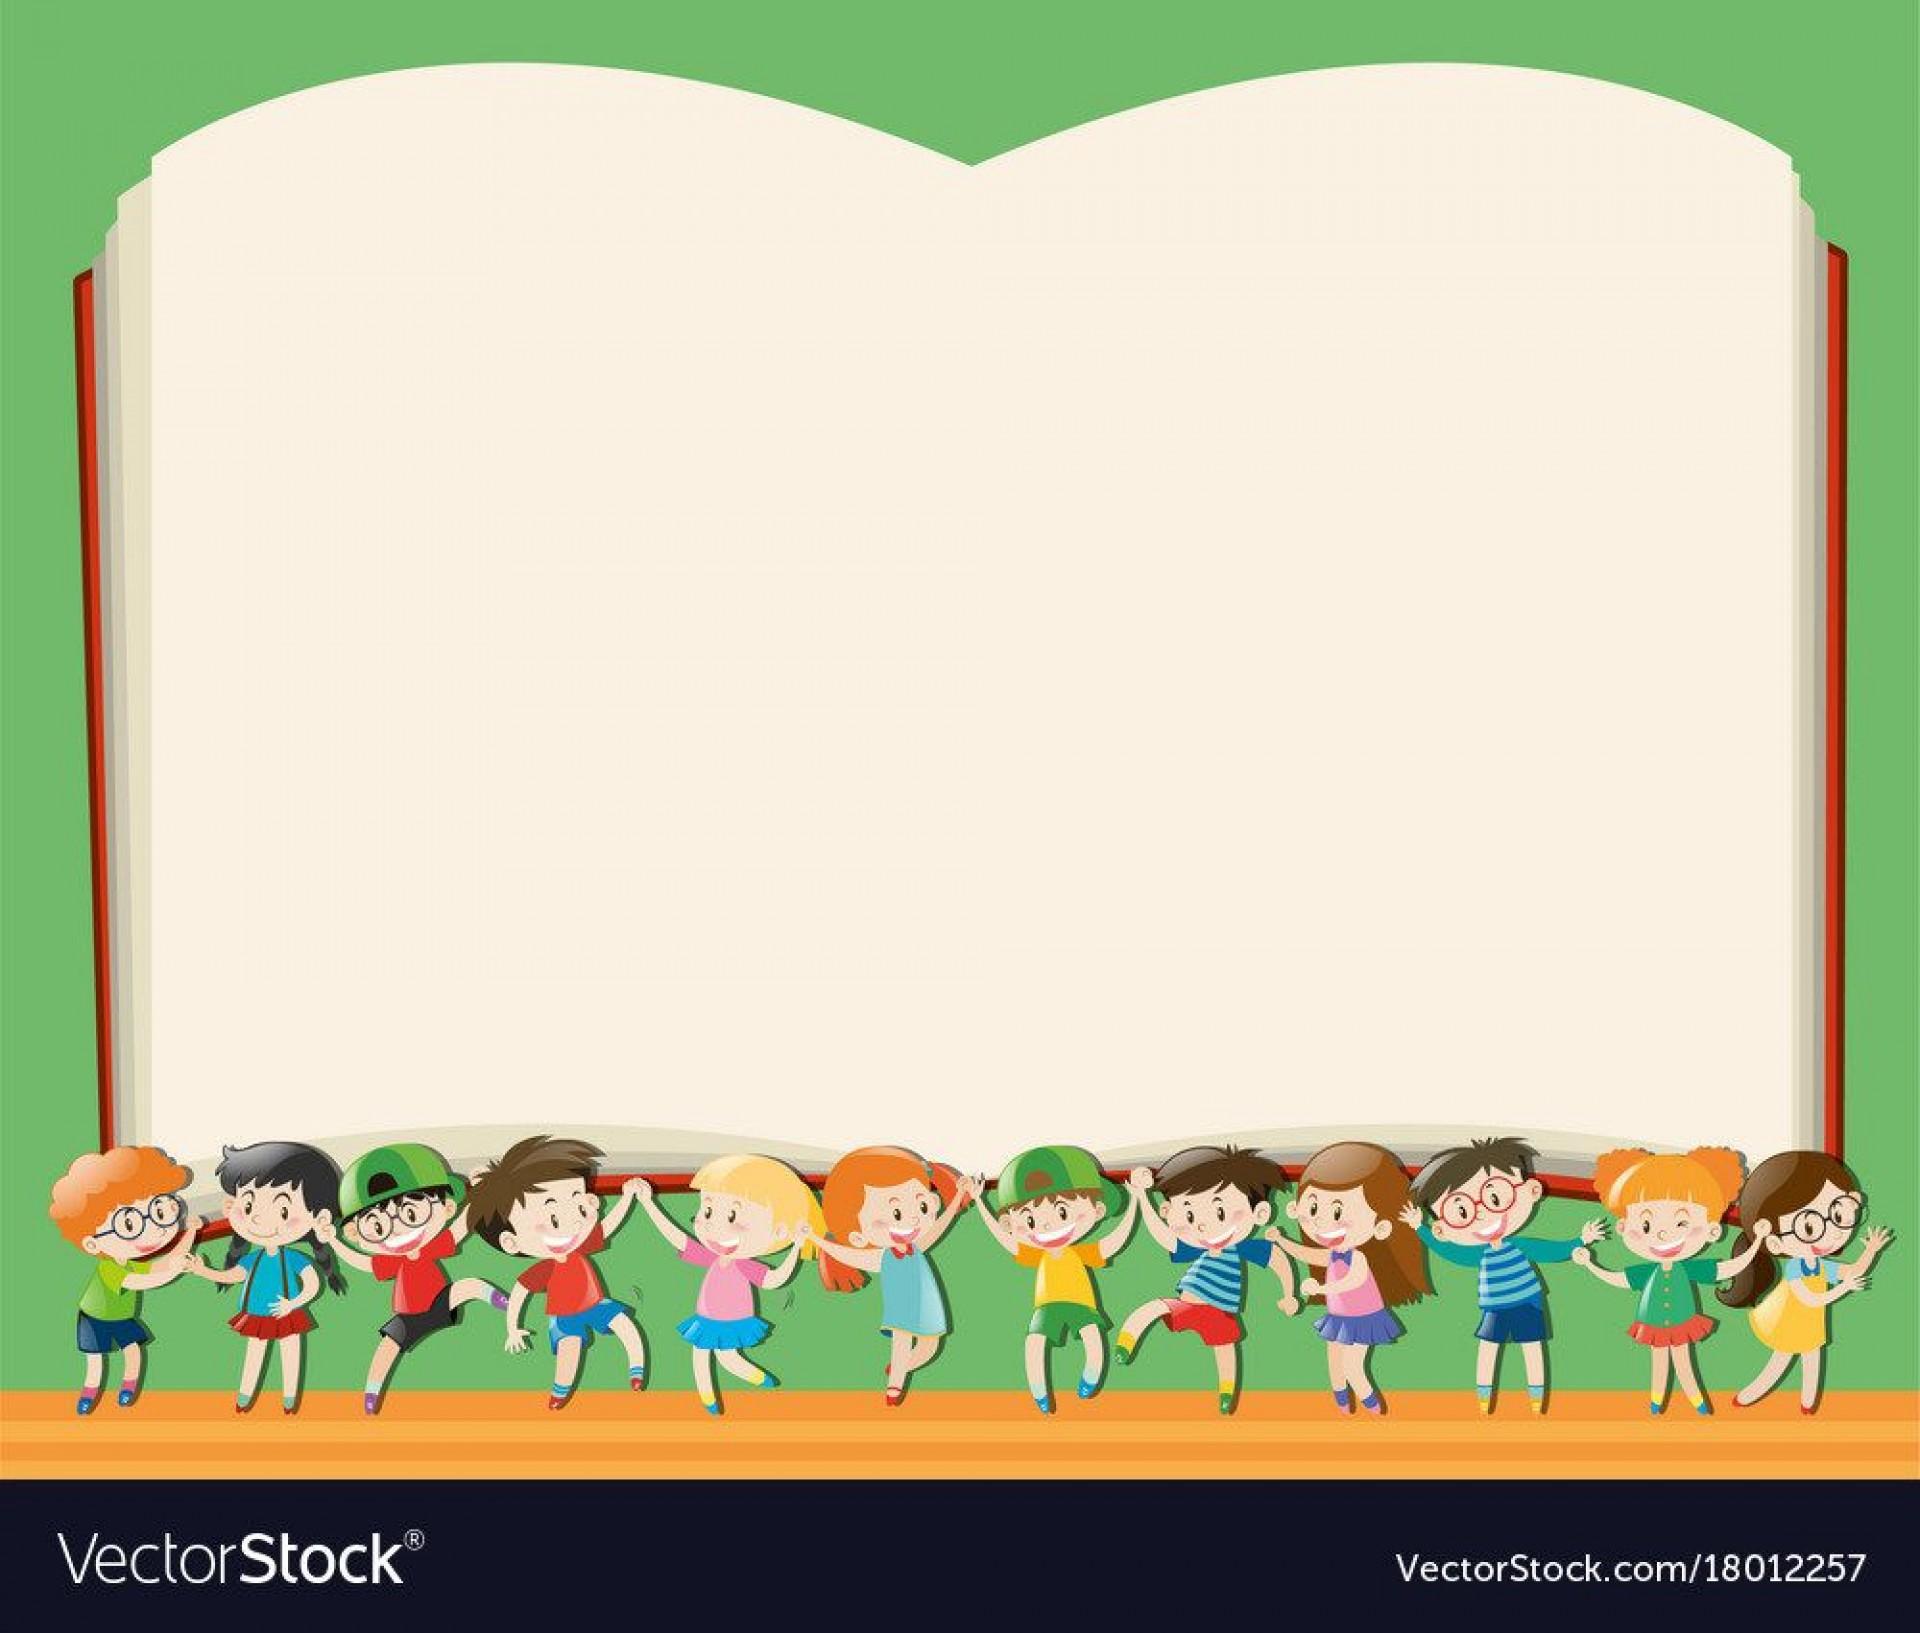 005 Dreaded Book Template For Kid Idea  Kids1920